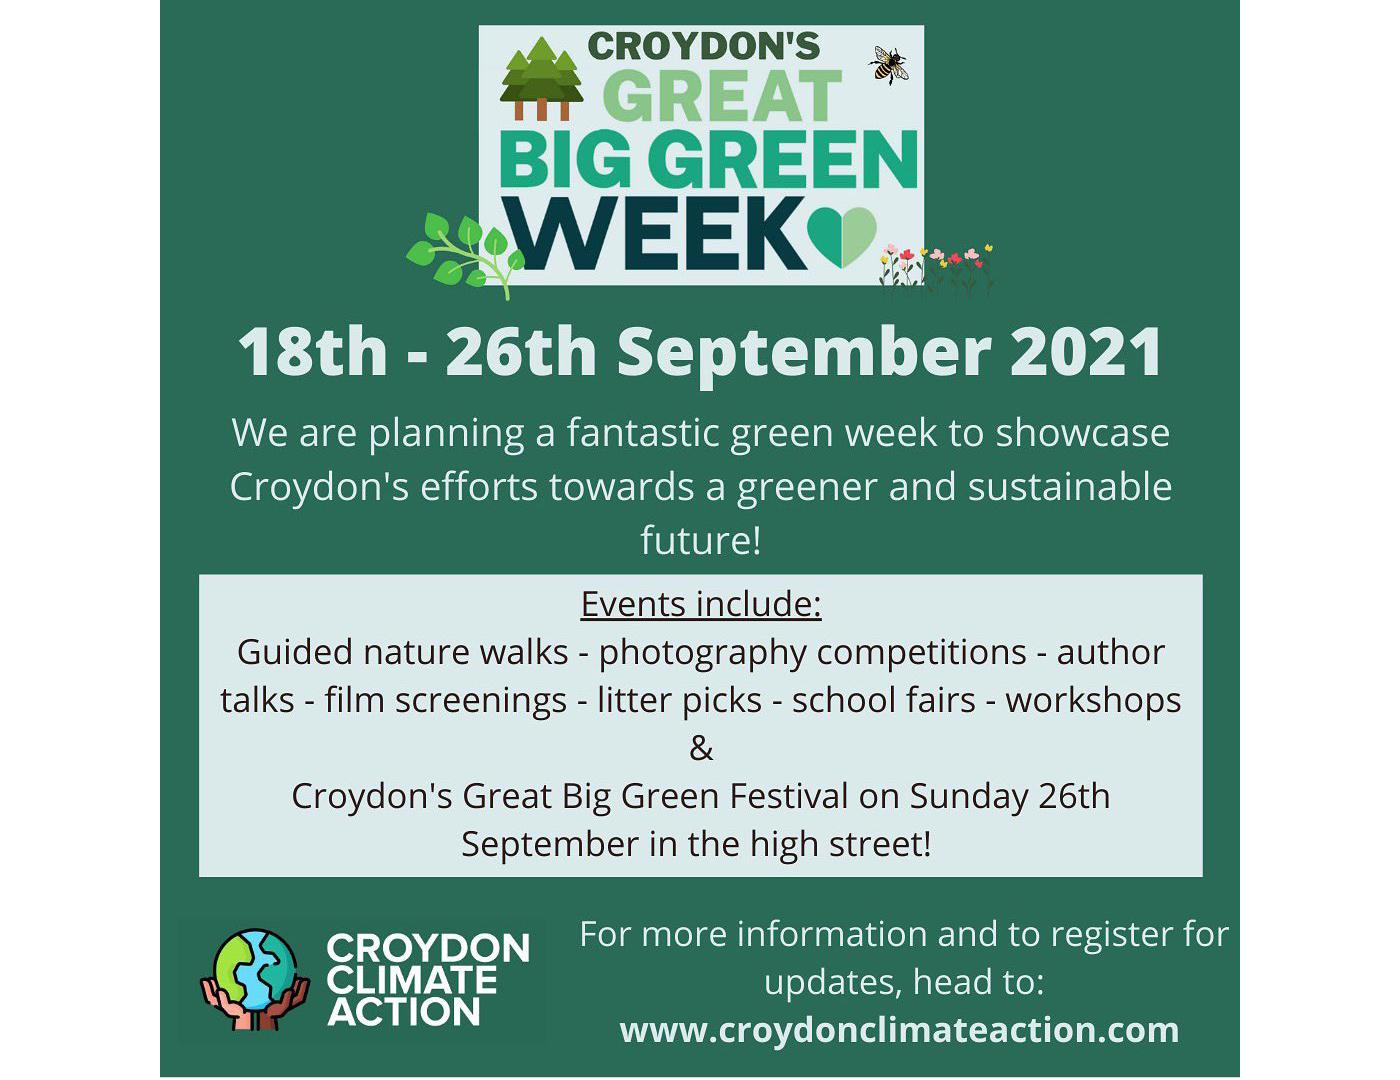 Croydon Climate Action